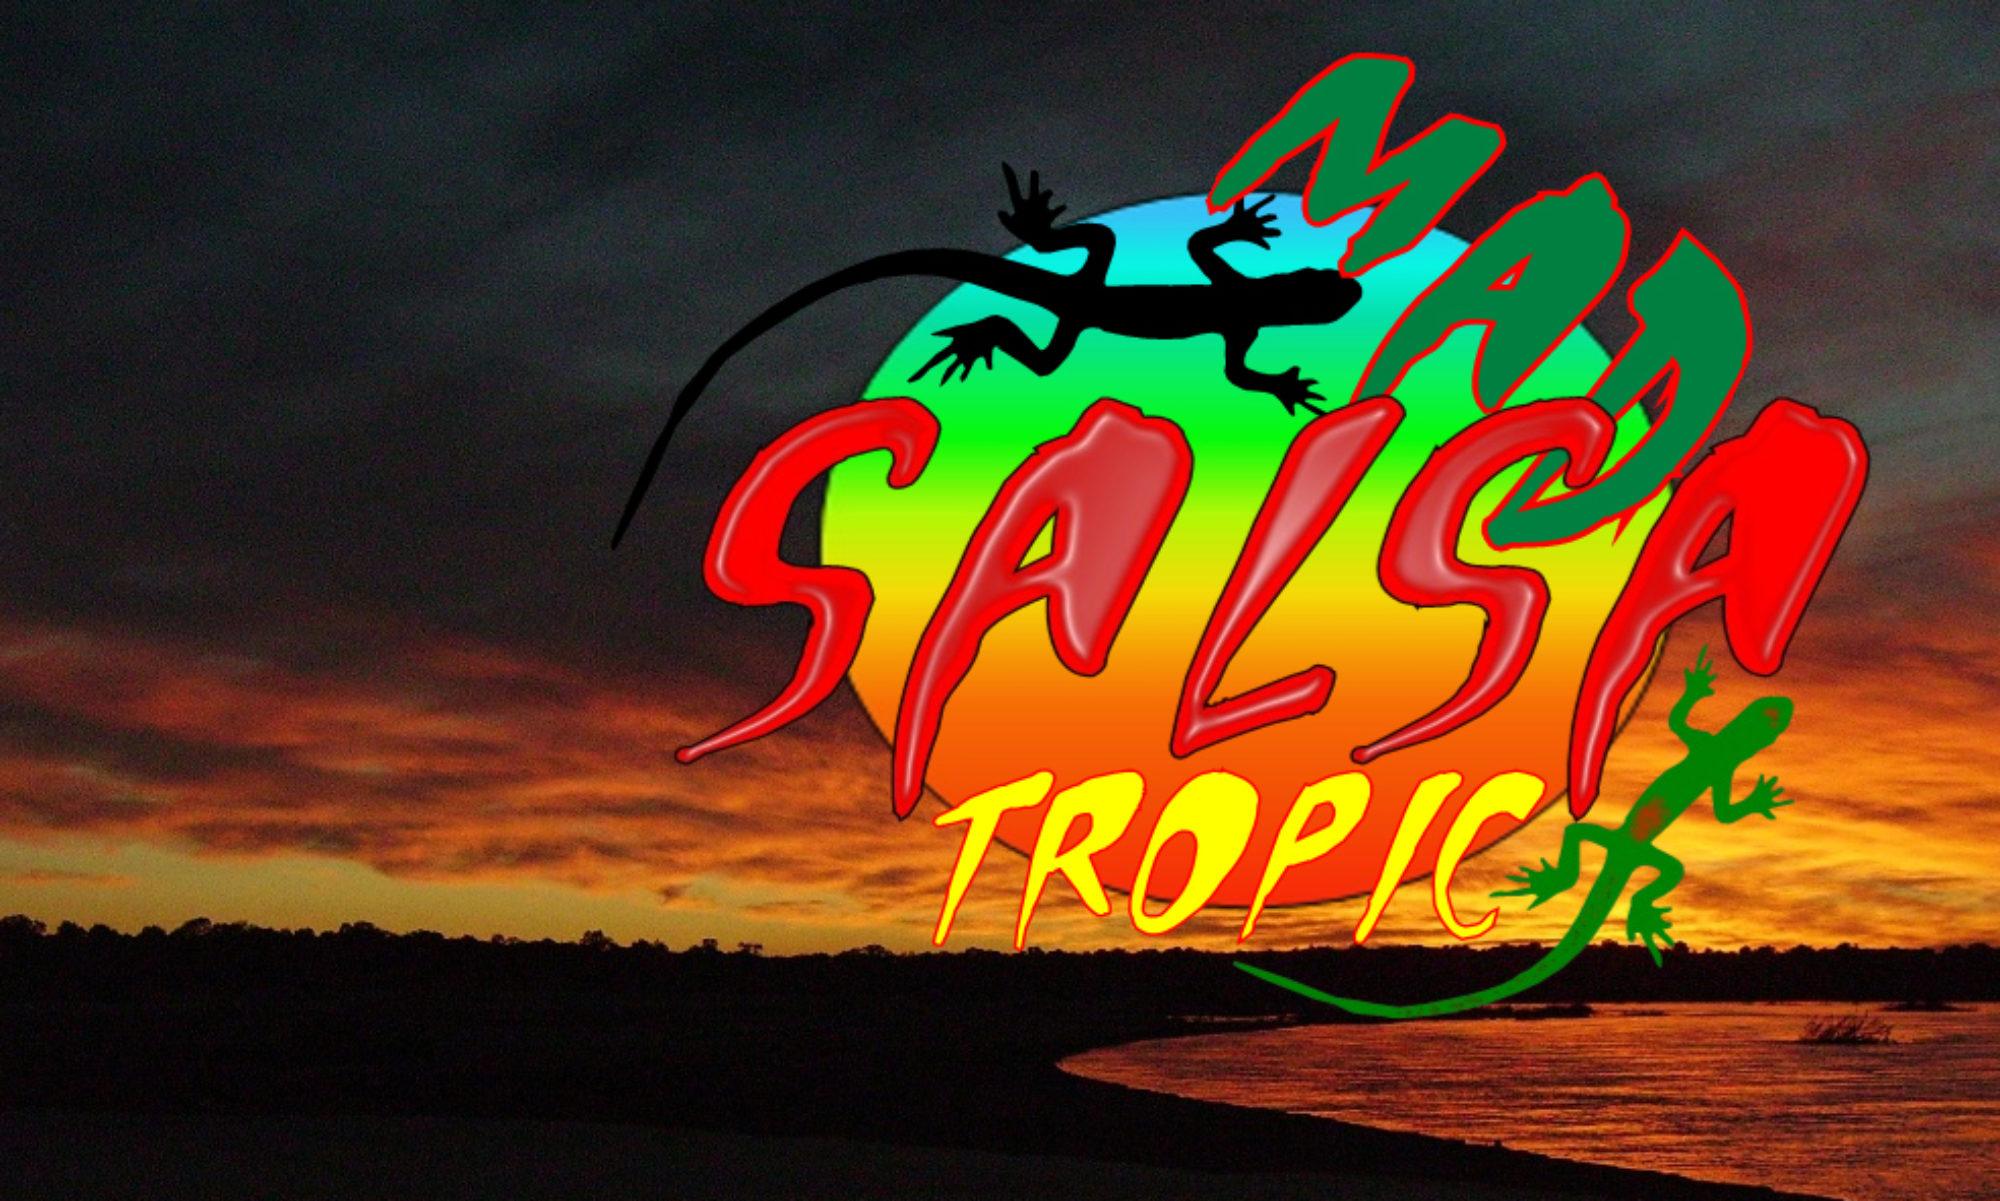 SALSA TROPIC MADA